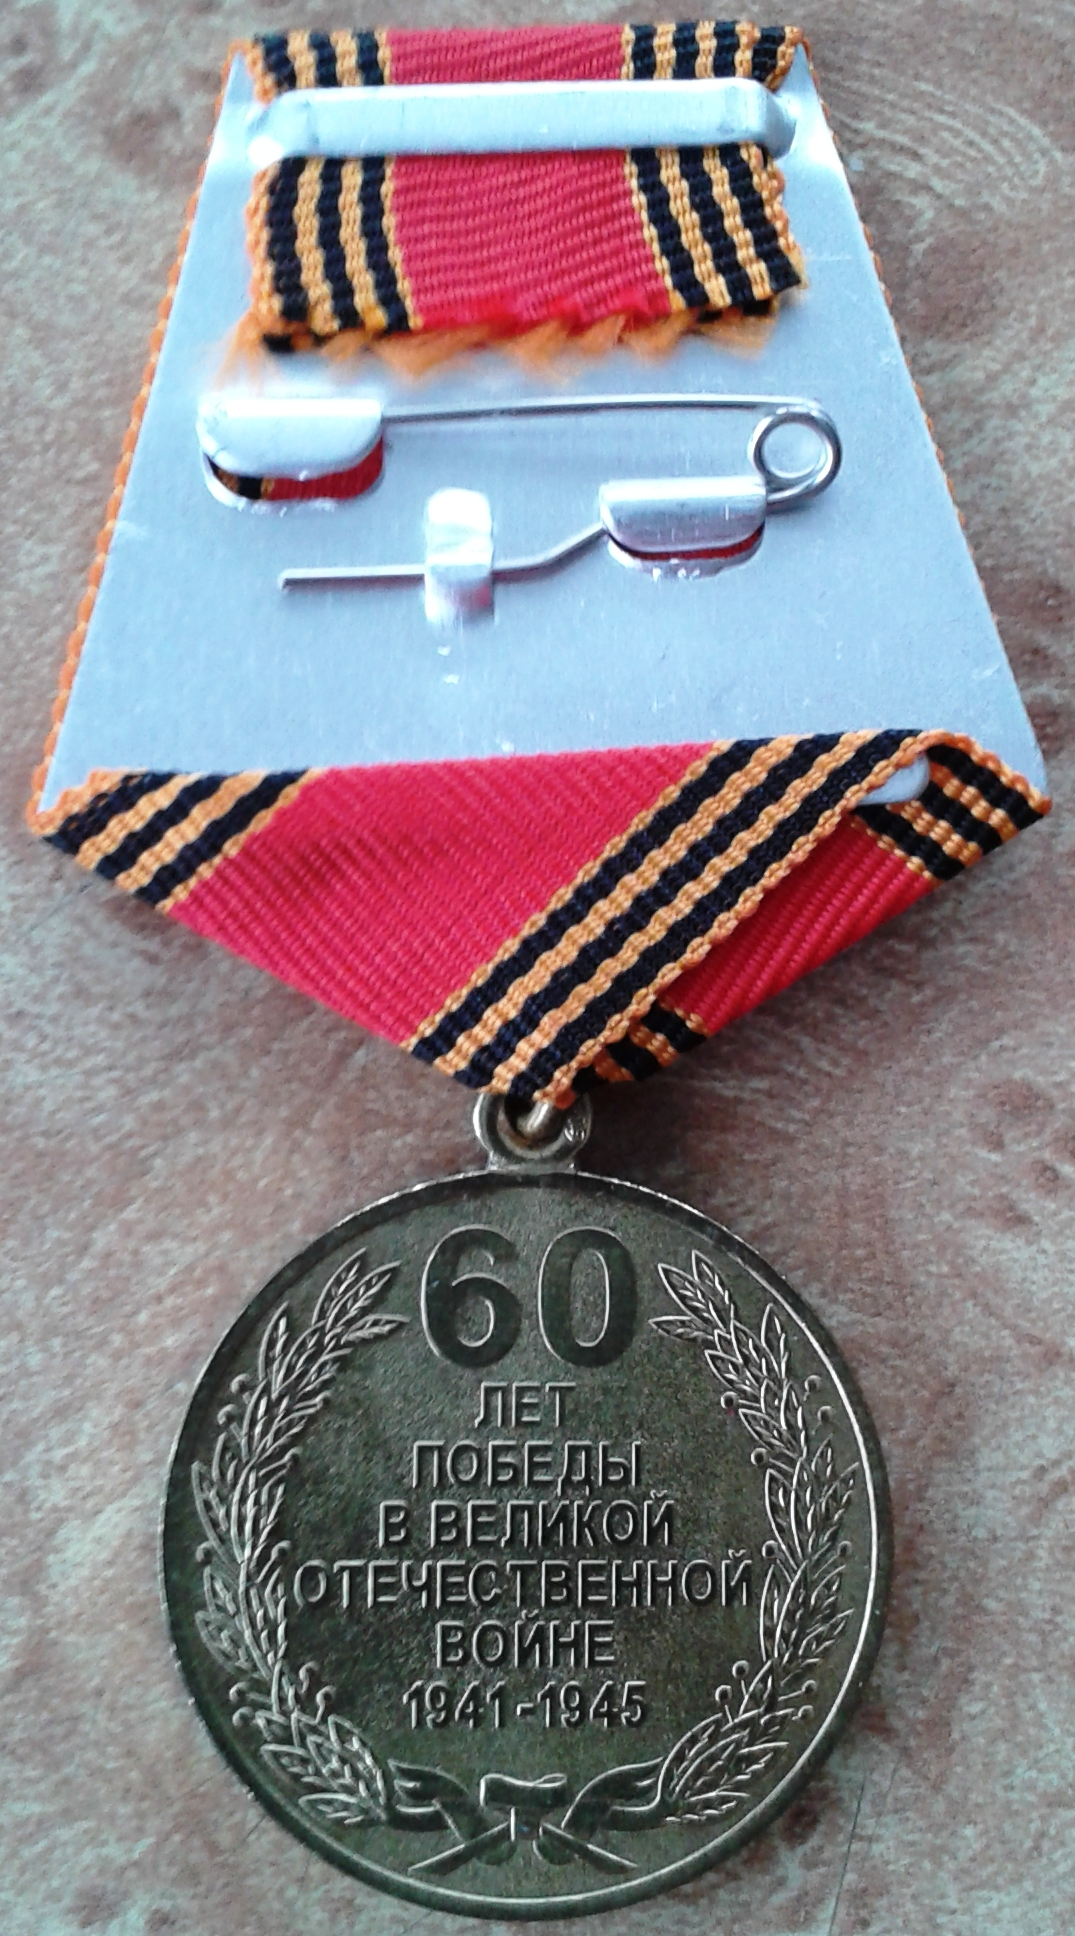 138. Медаль 60 лет Победы, Барыкина МГ, 2005